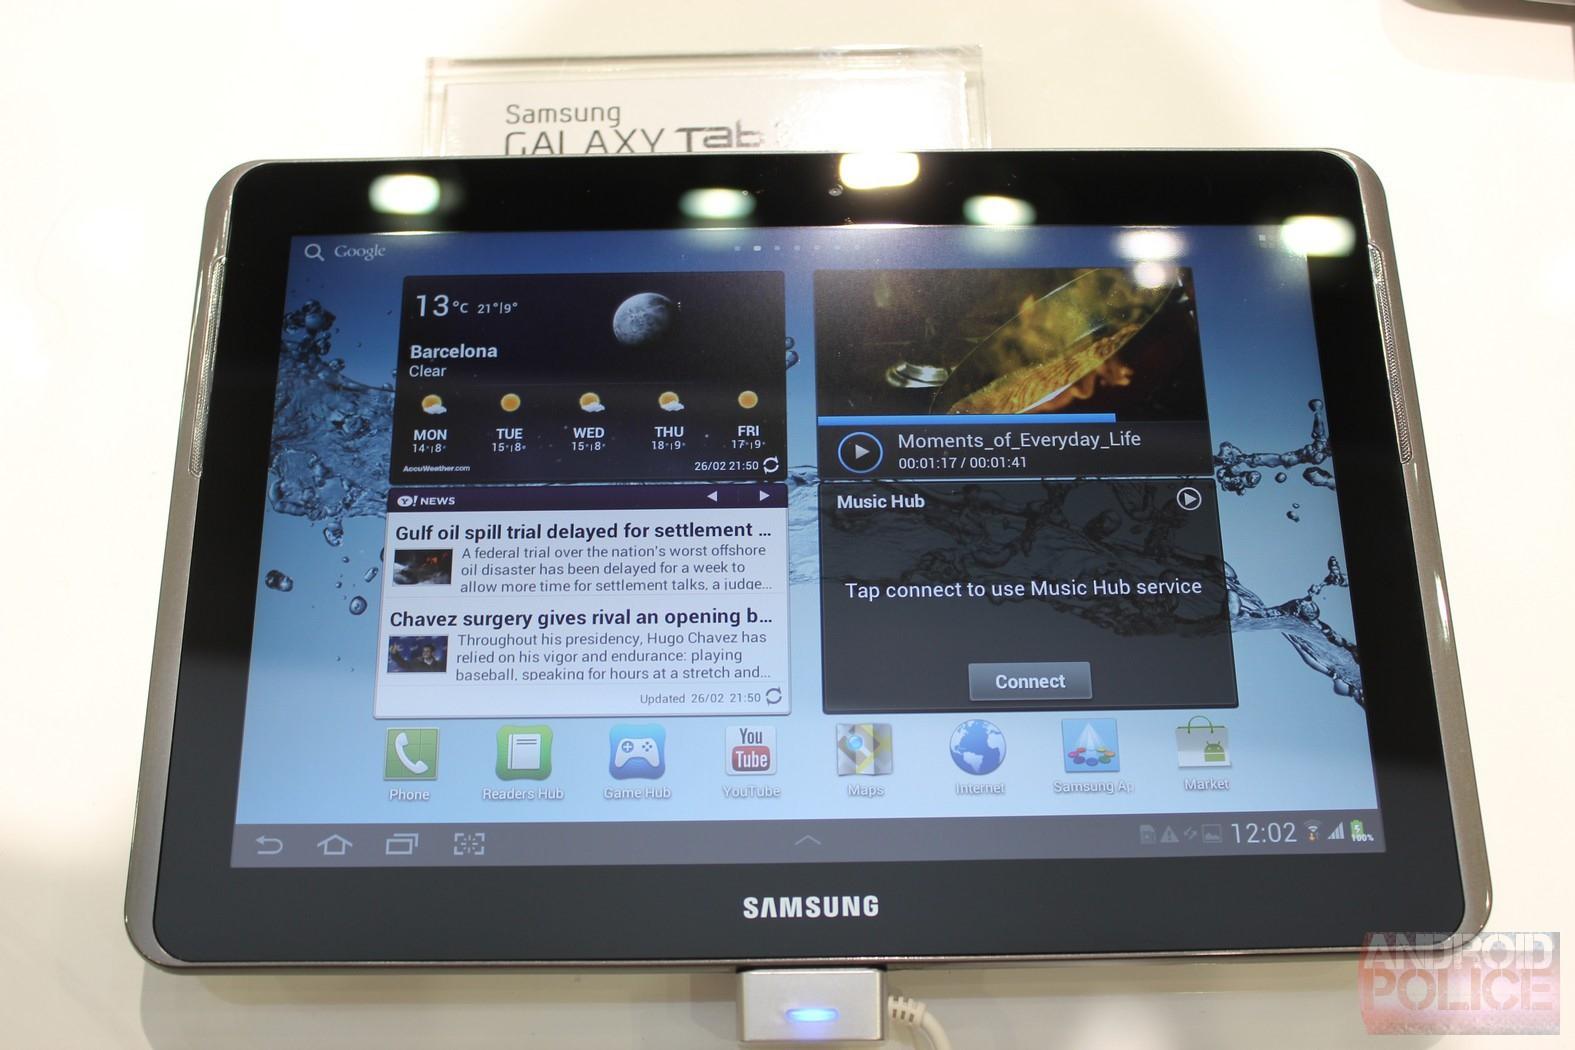 Планшет Samsung Galaxy Tab 2 10.1 на базе Android 4.0 представлен официально